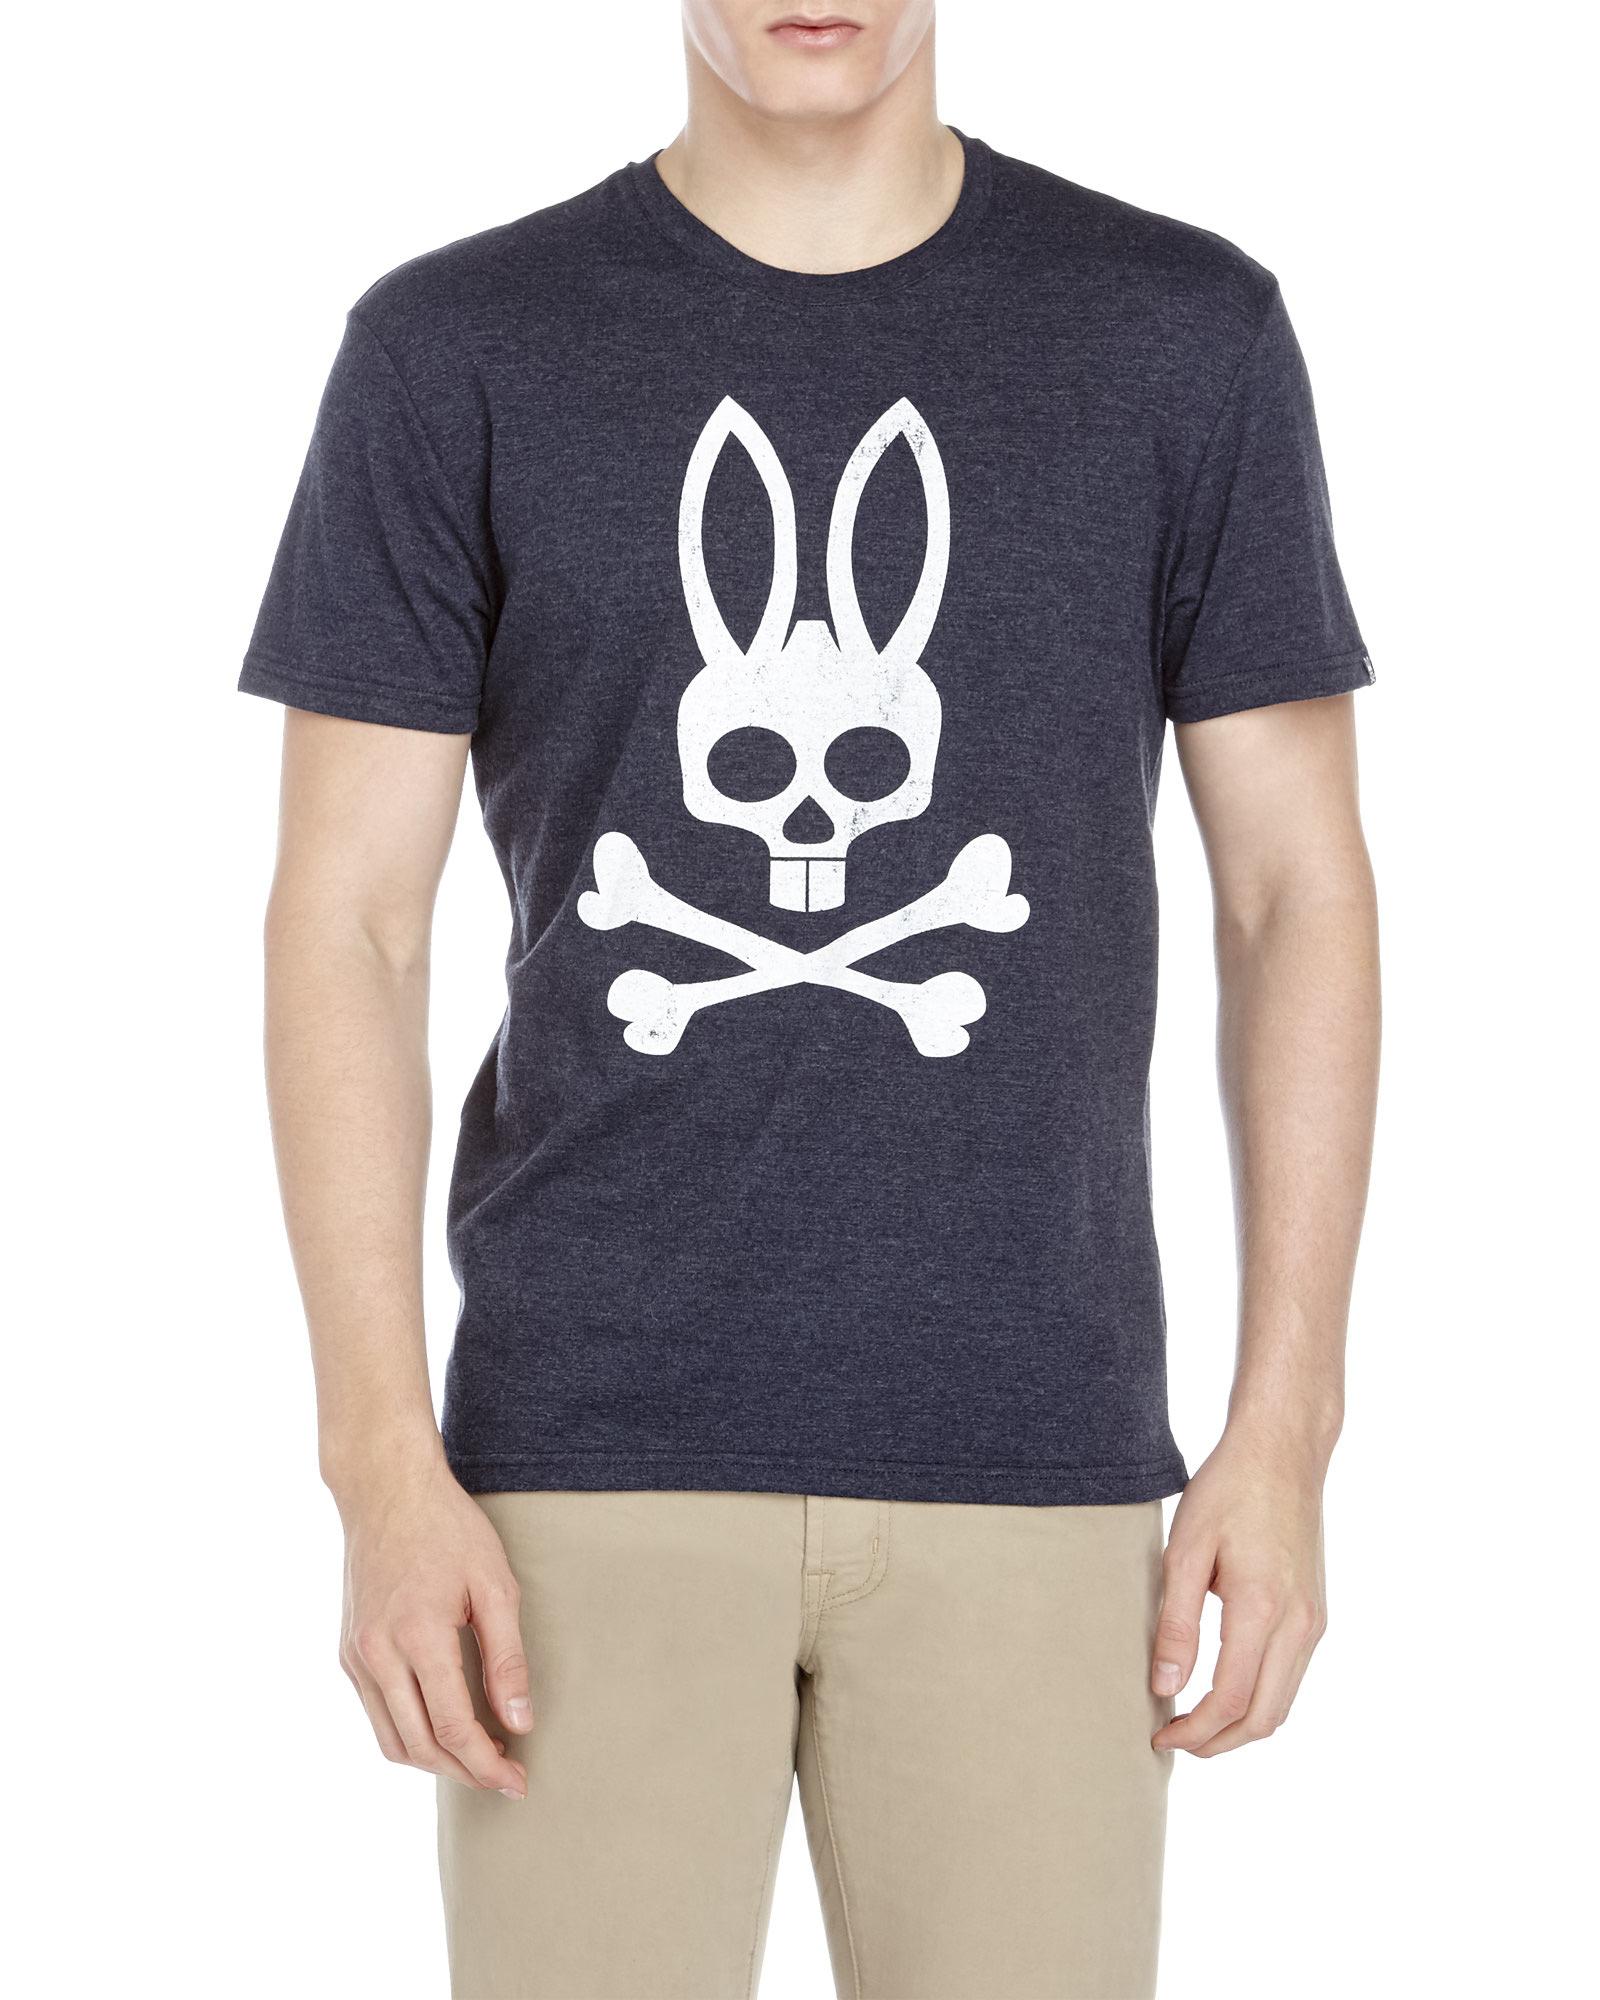 lyst psycho bunny logo bunny tee in blue for men. Black Bedroom Furniture Sets. Home Design Ideas